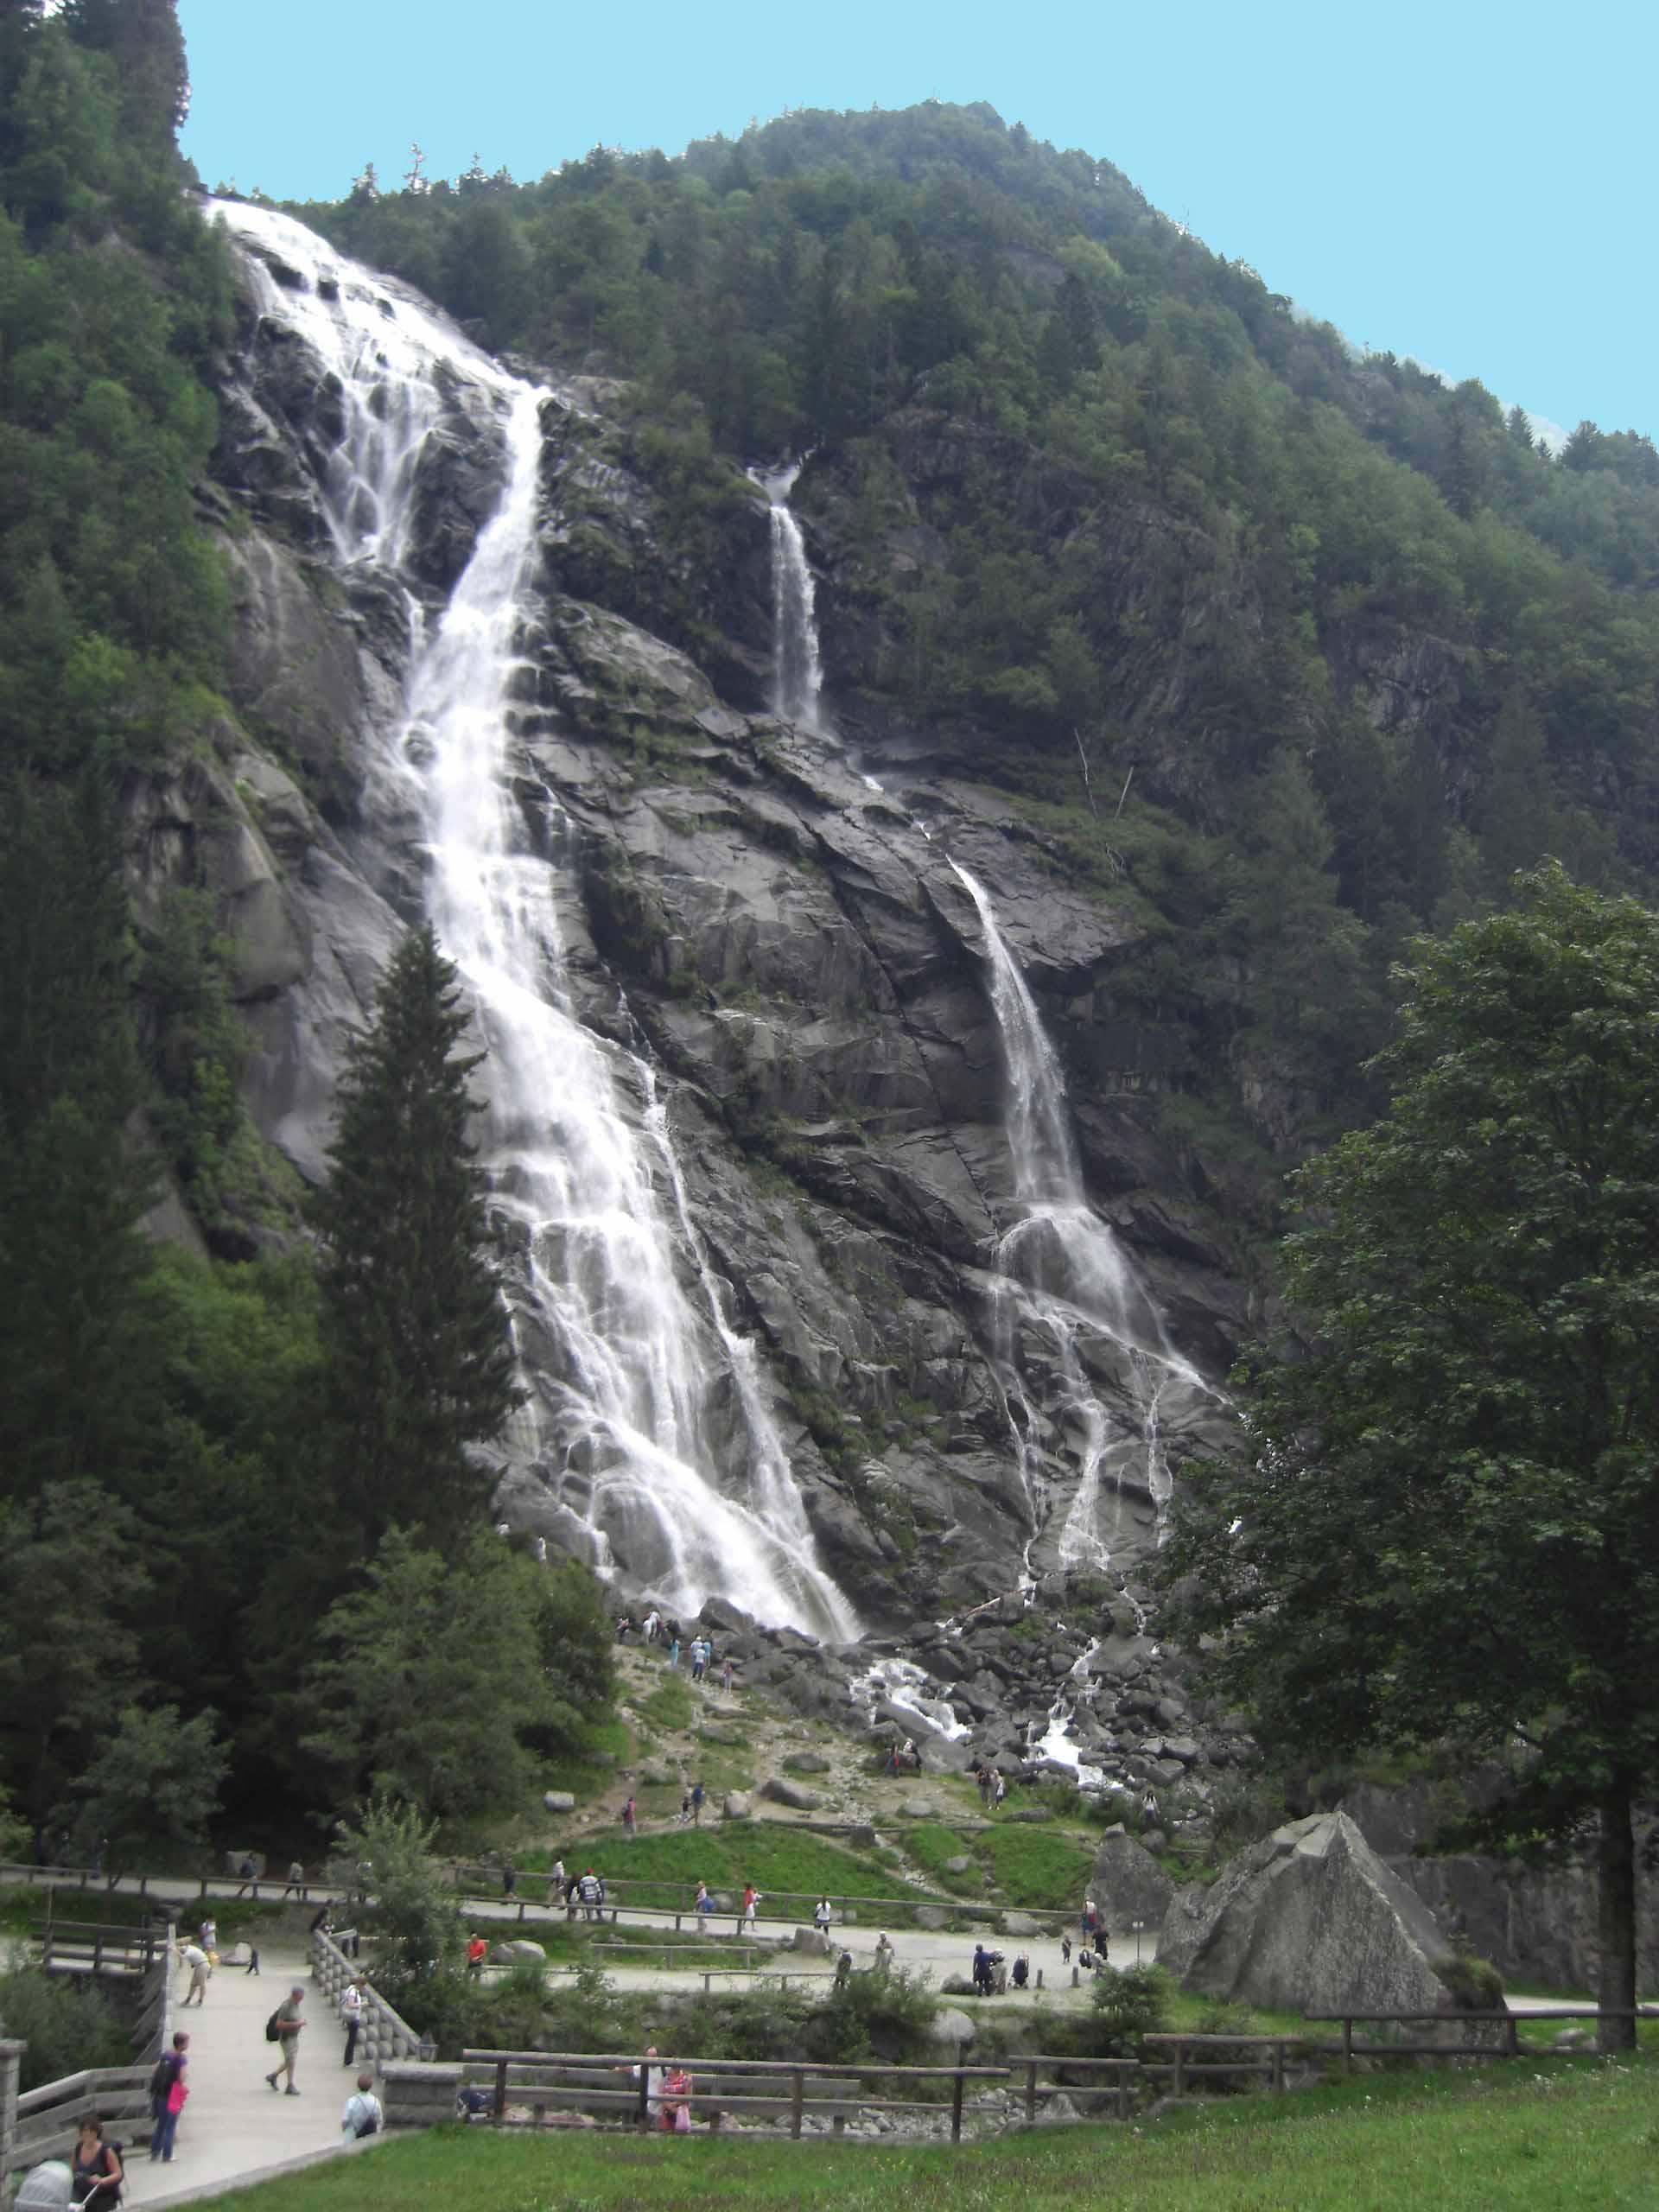 Parco naturale Adamello Brenta (Tn)